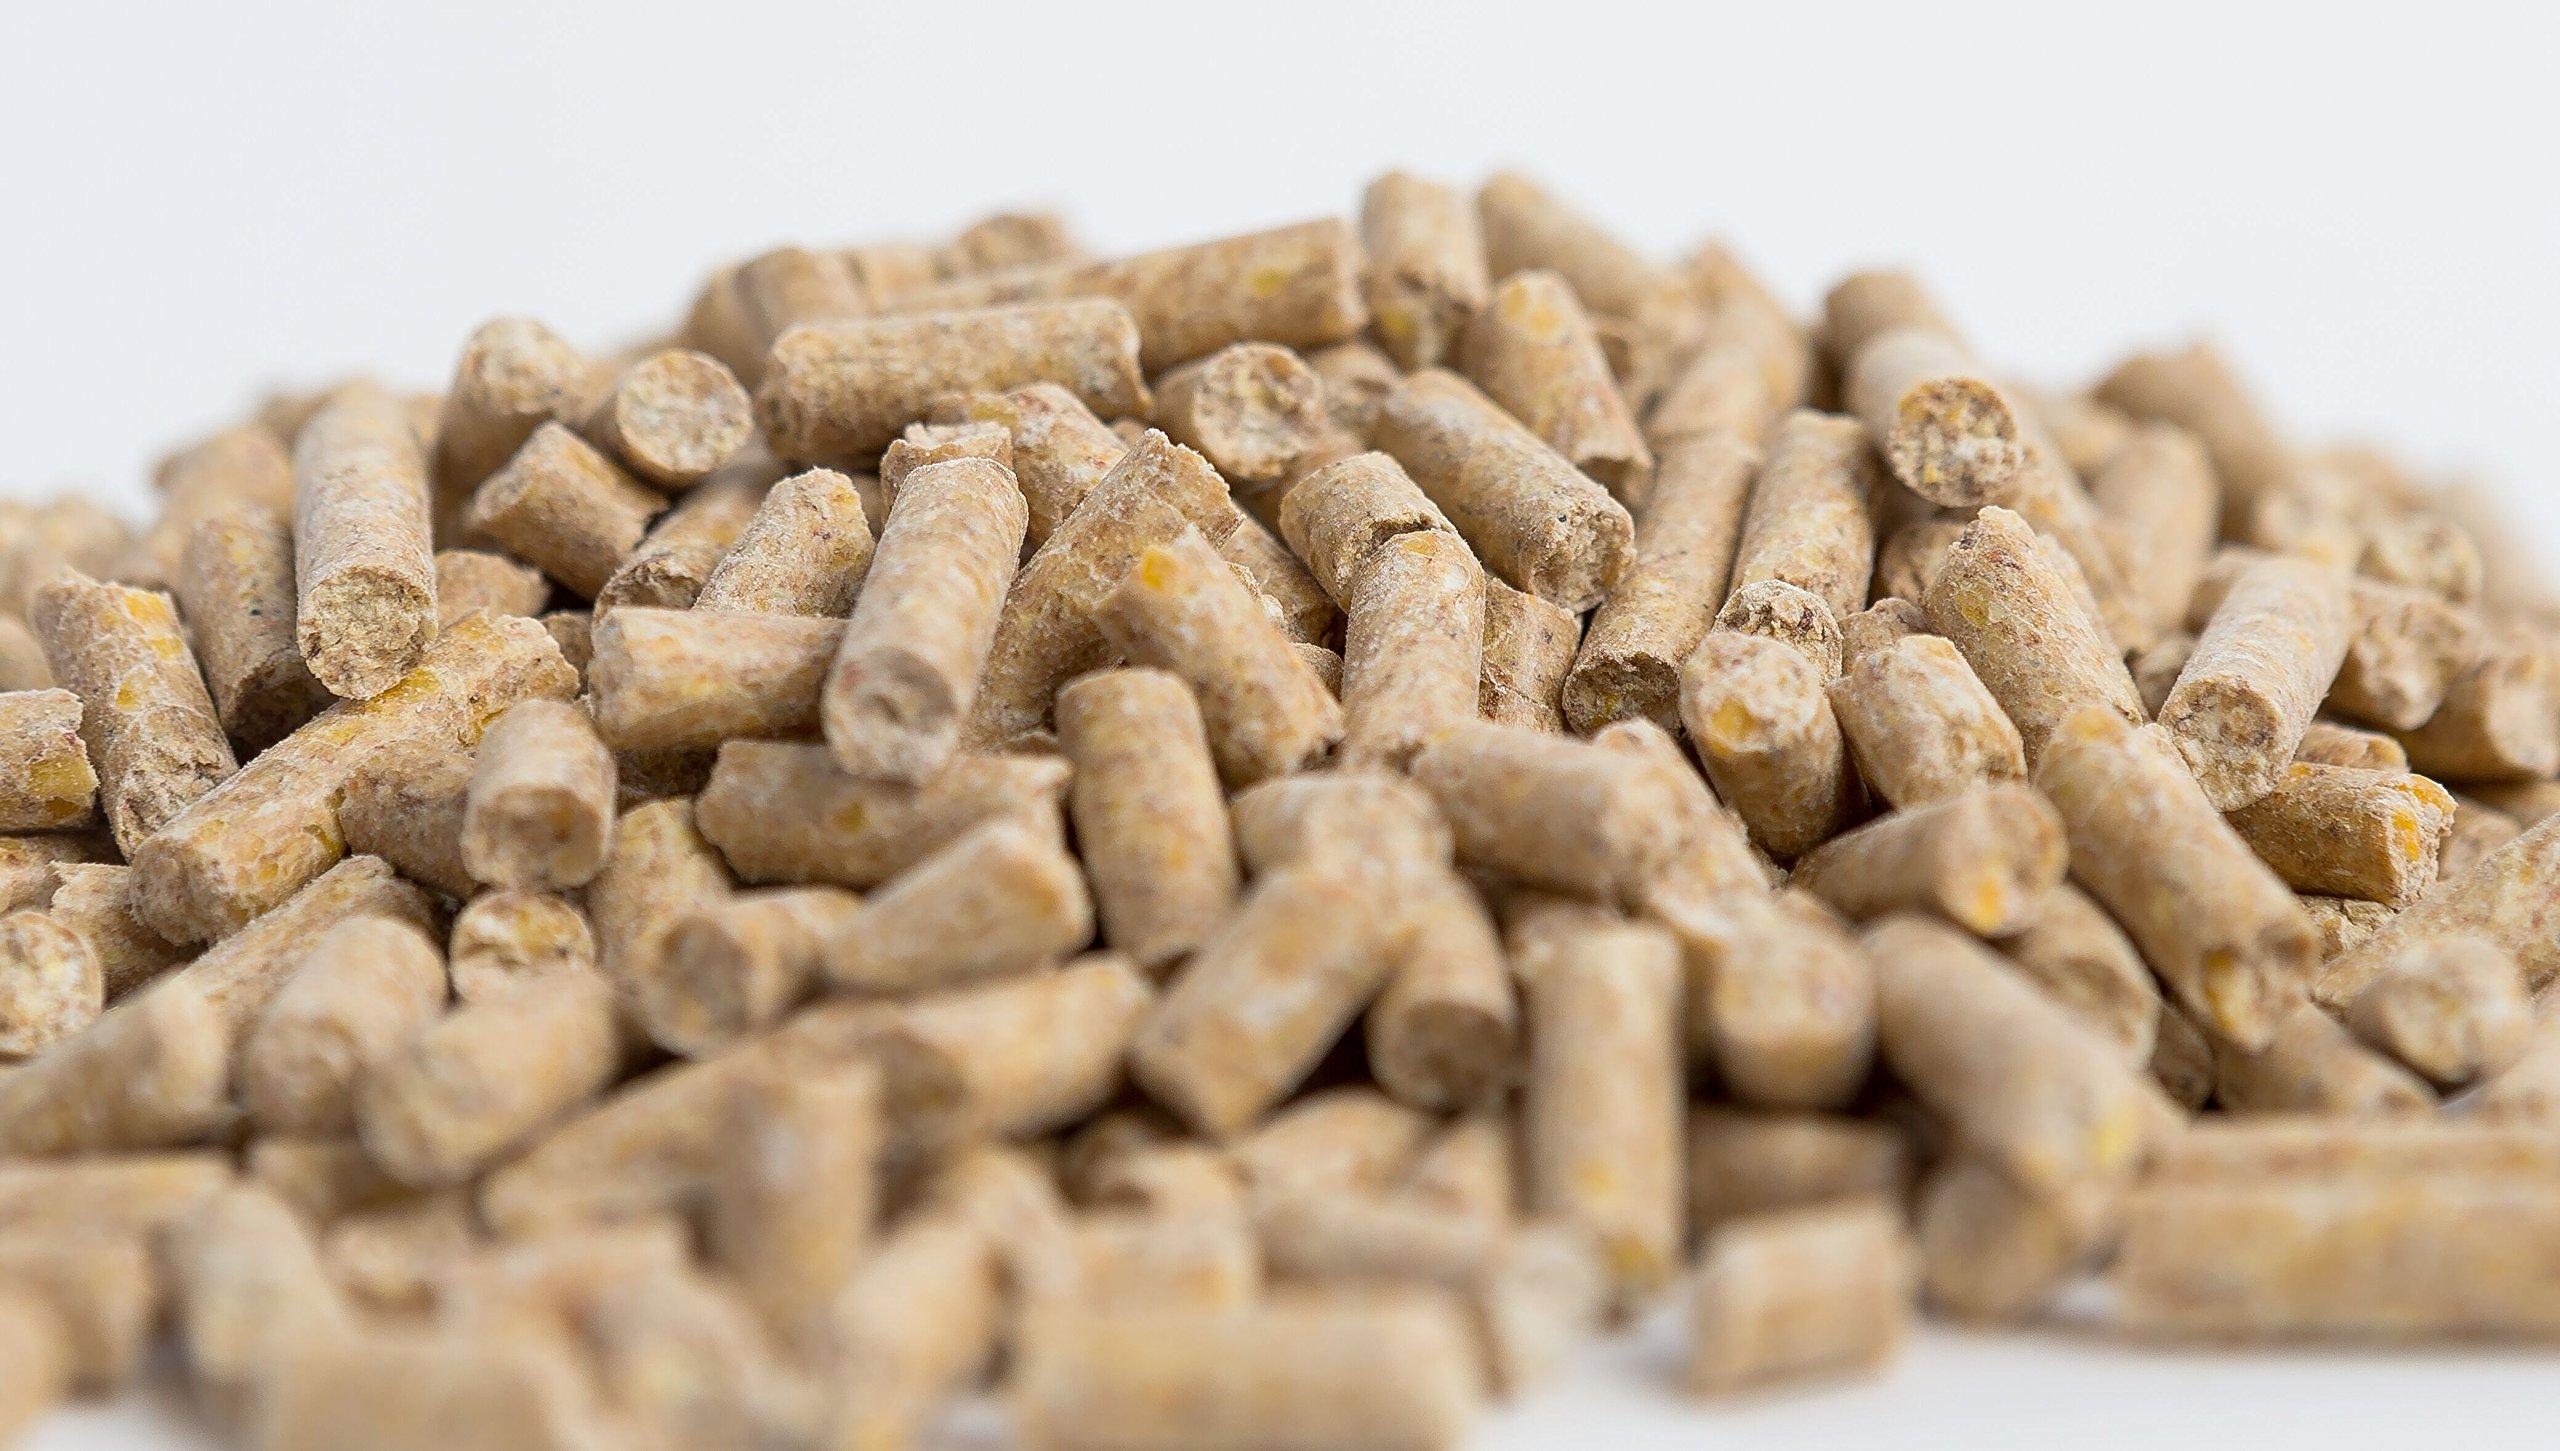 Horse Guard Mega Dose Equine Vitamin Mineral Hoof & Probiotic Supplement, 40 lb by Horse Guard (Image #5)